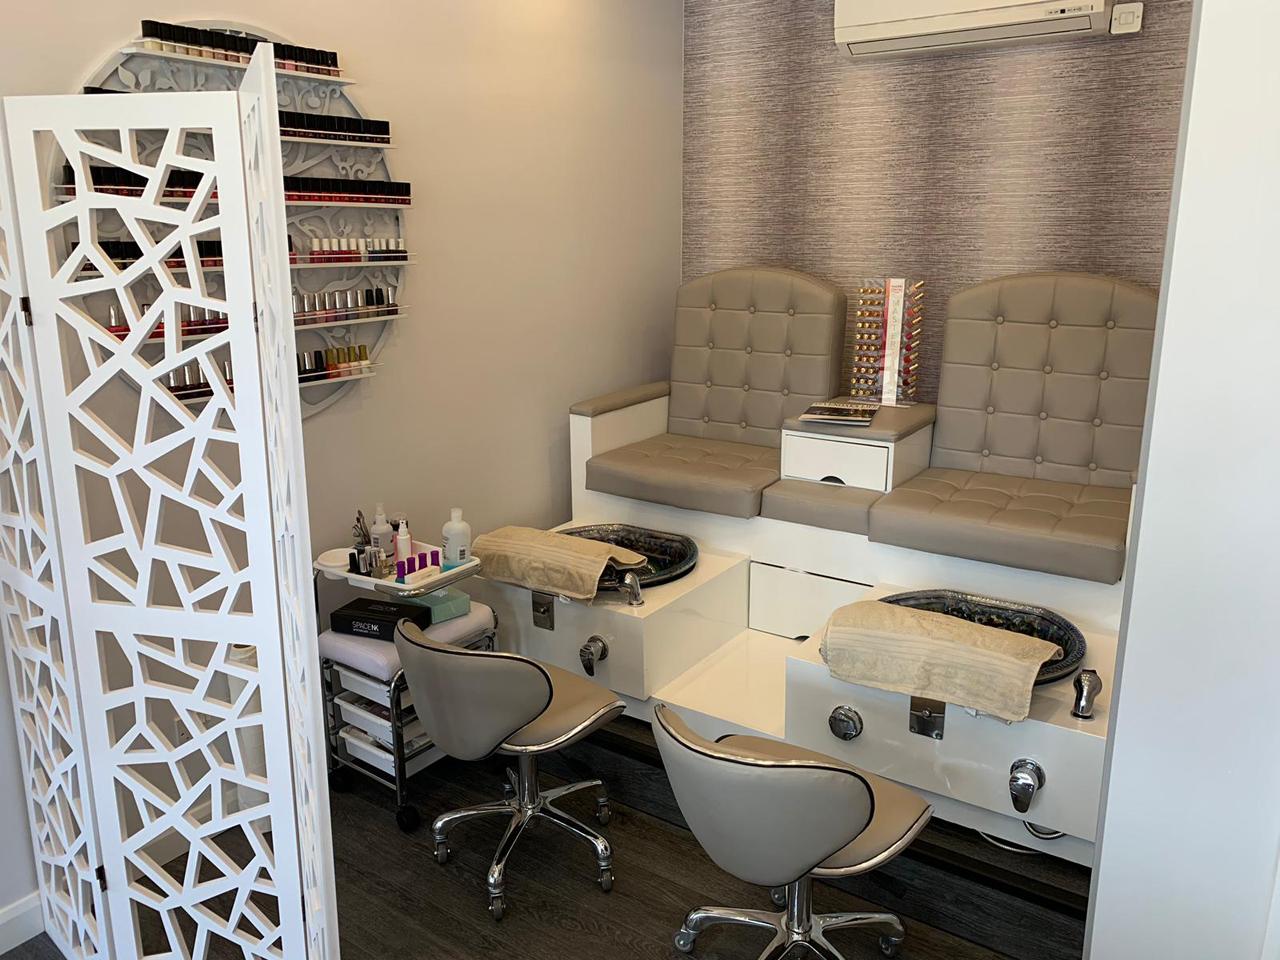 DeVita Beauty & Aesthetics - My Story - Treatment Area 1